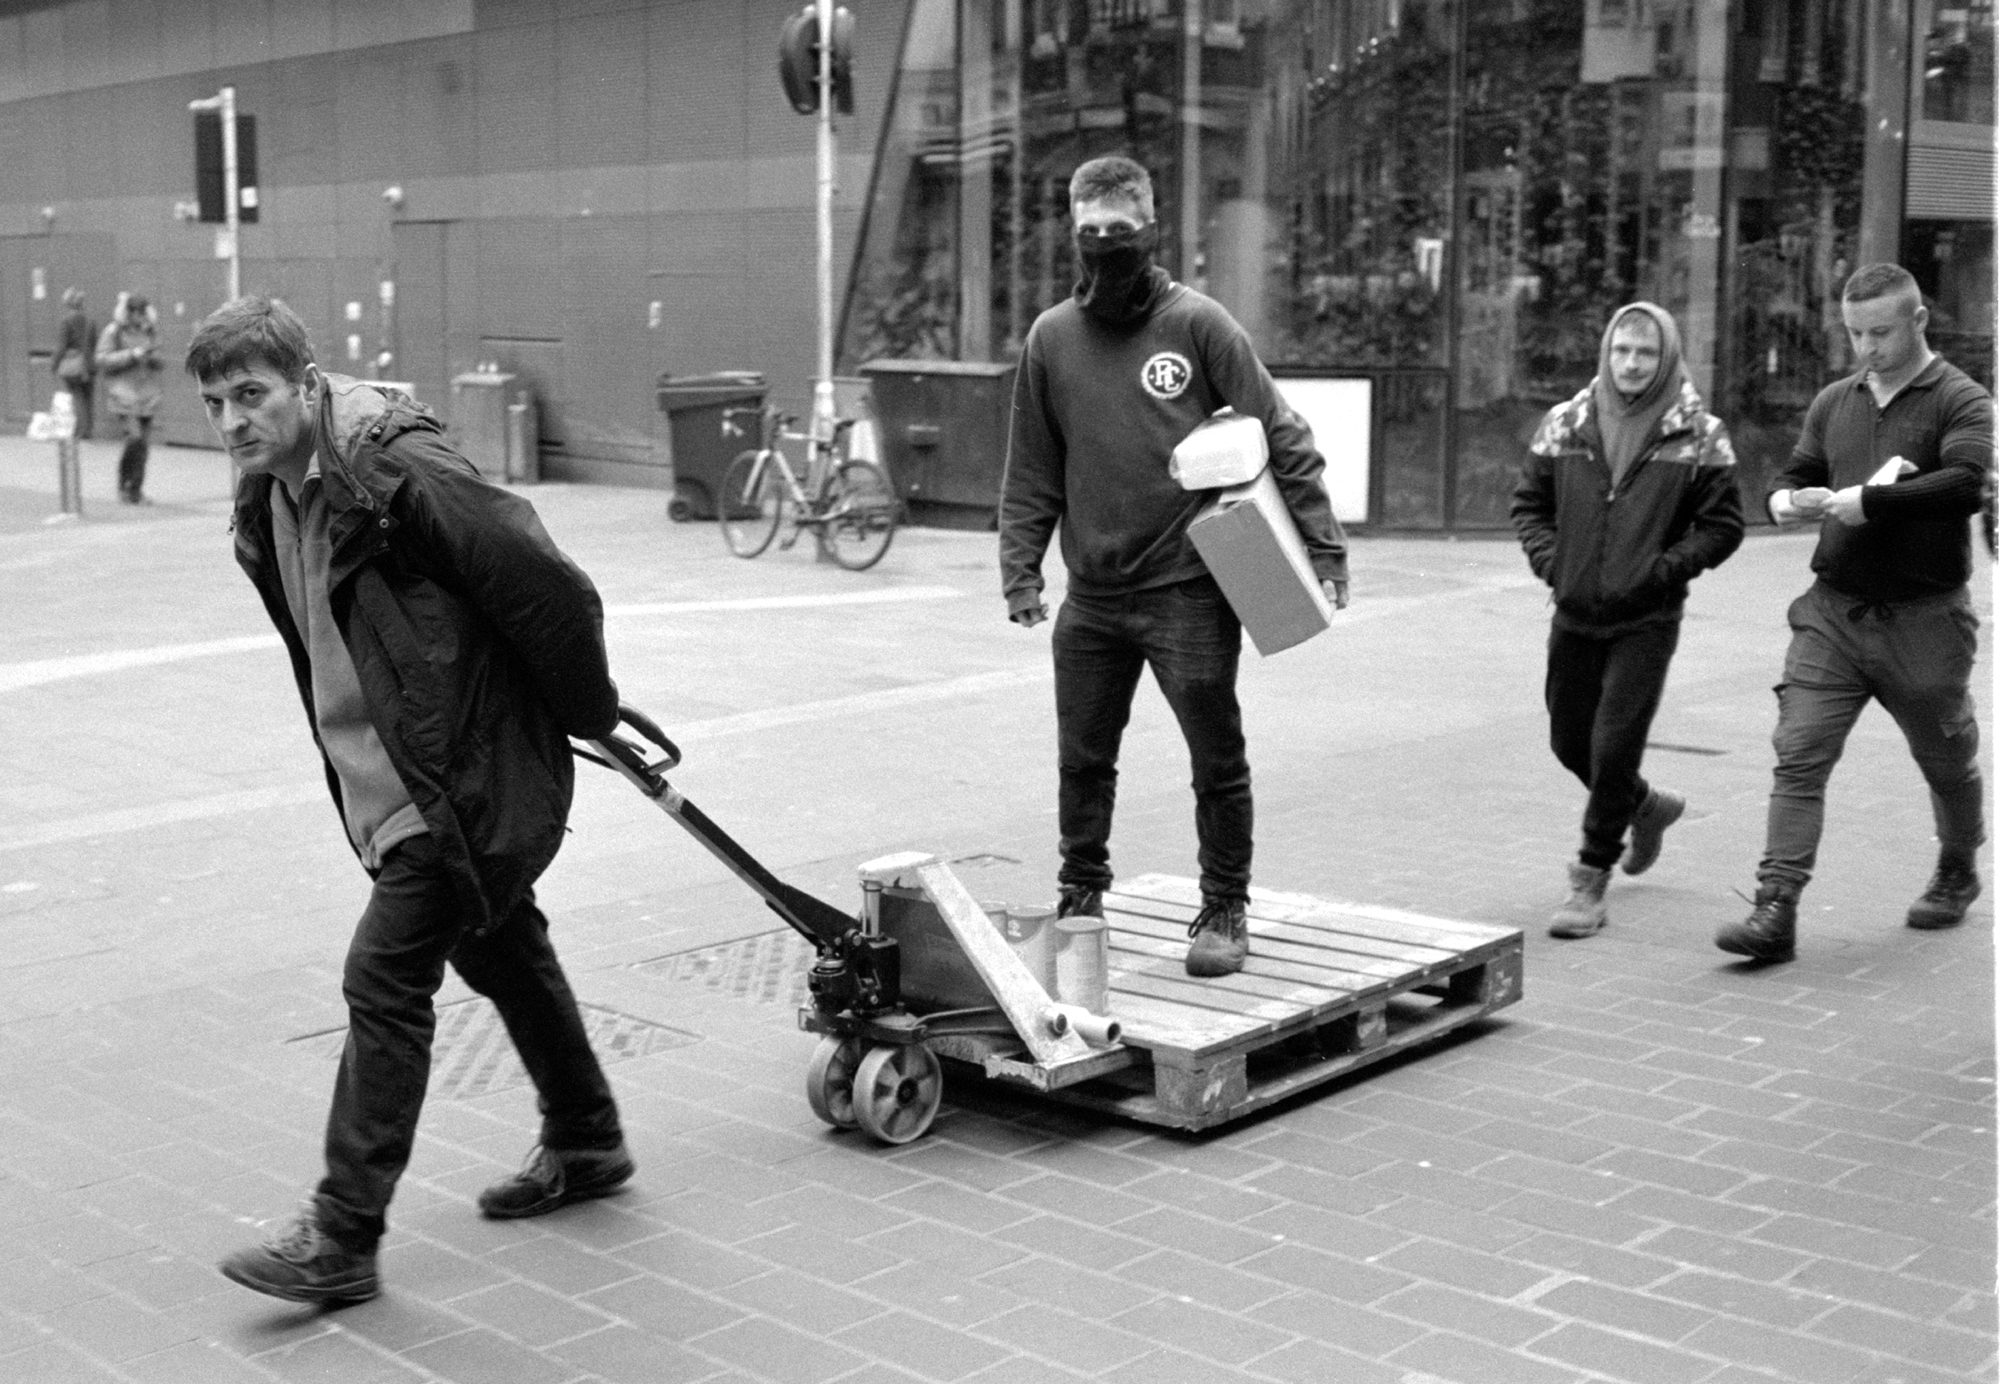 Kentmere 400 @400. Chinatown, London, 2020. Leica M6.